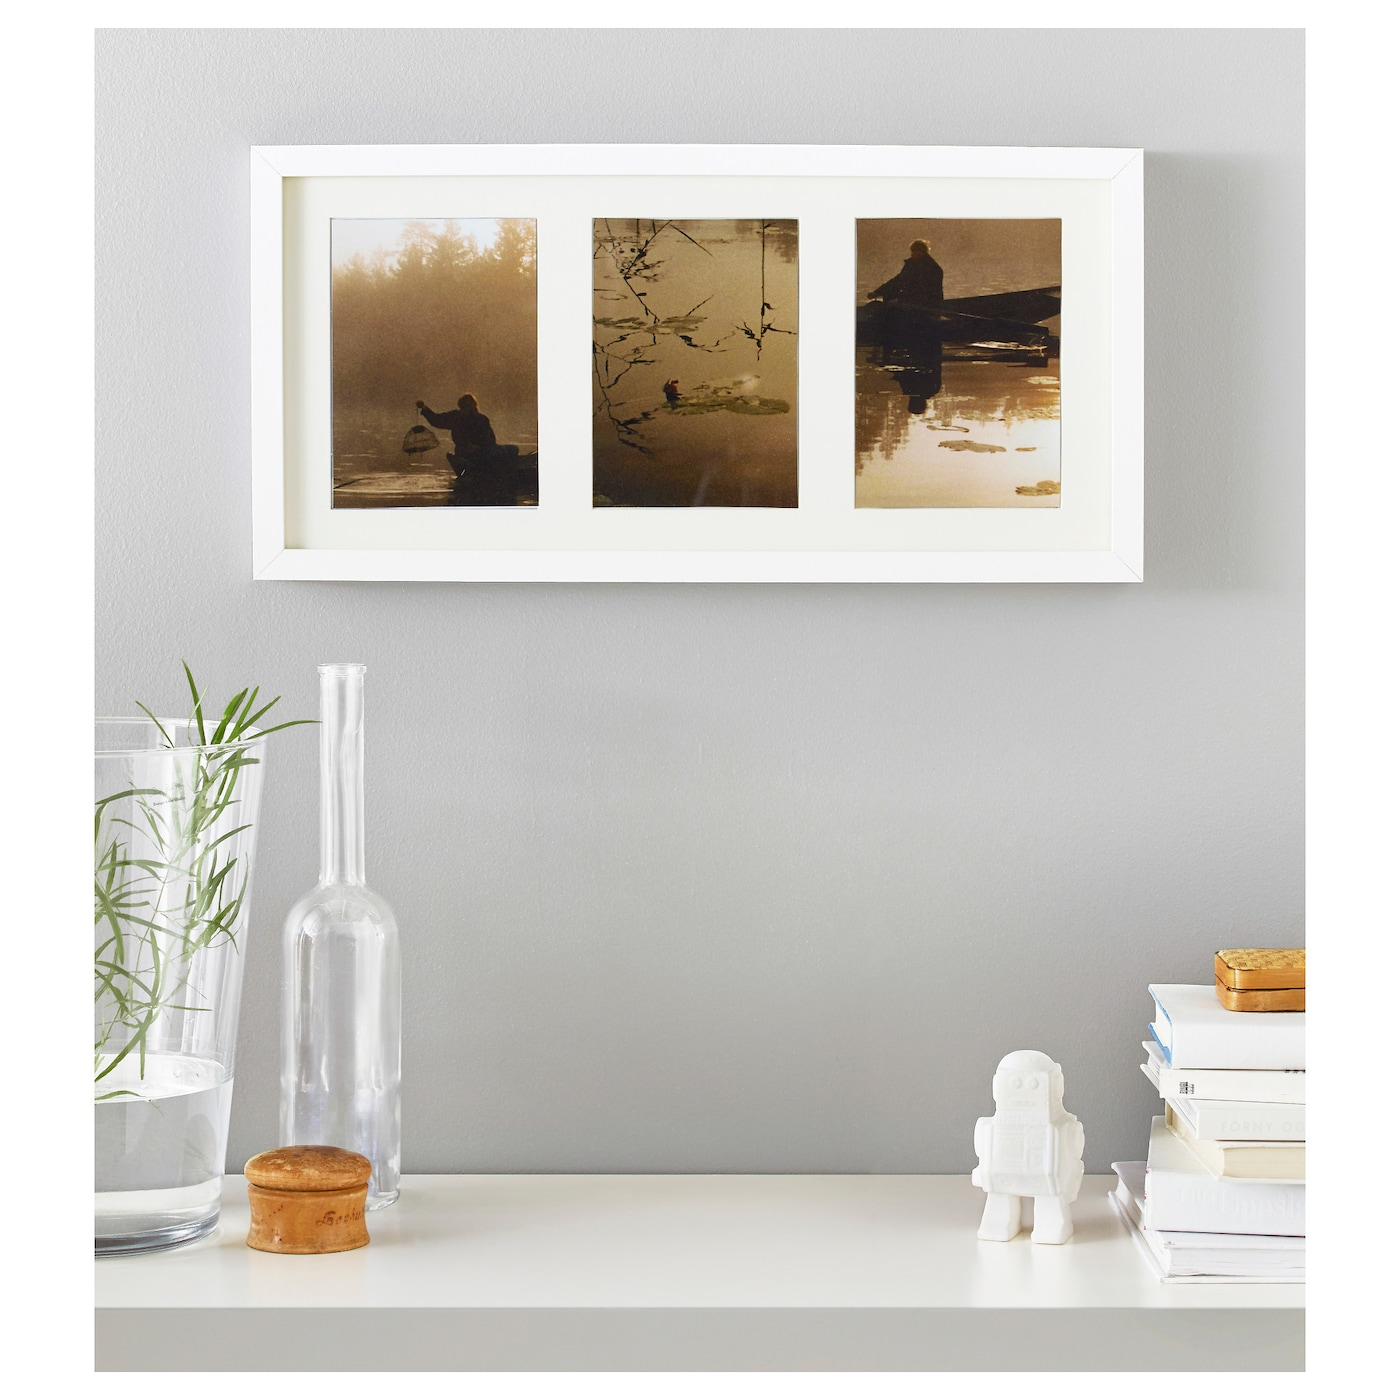 RIBBA Frame White 50 x 23 cm - IKEA